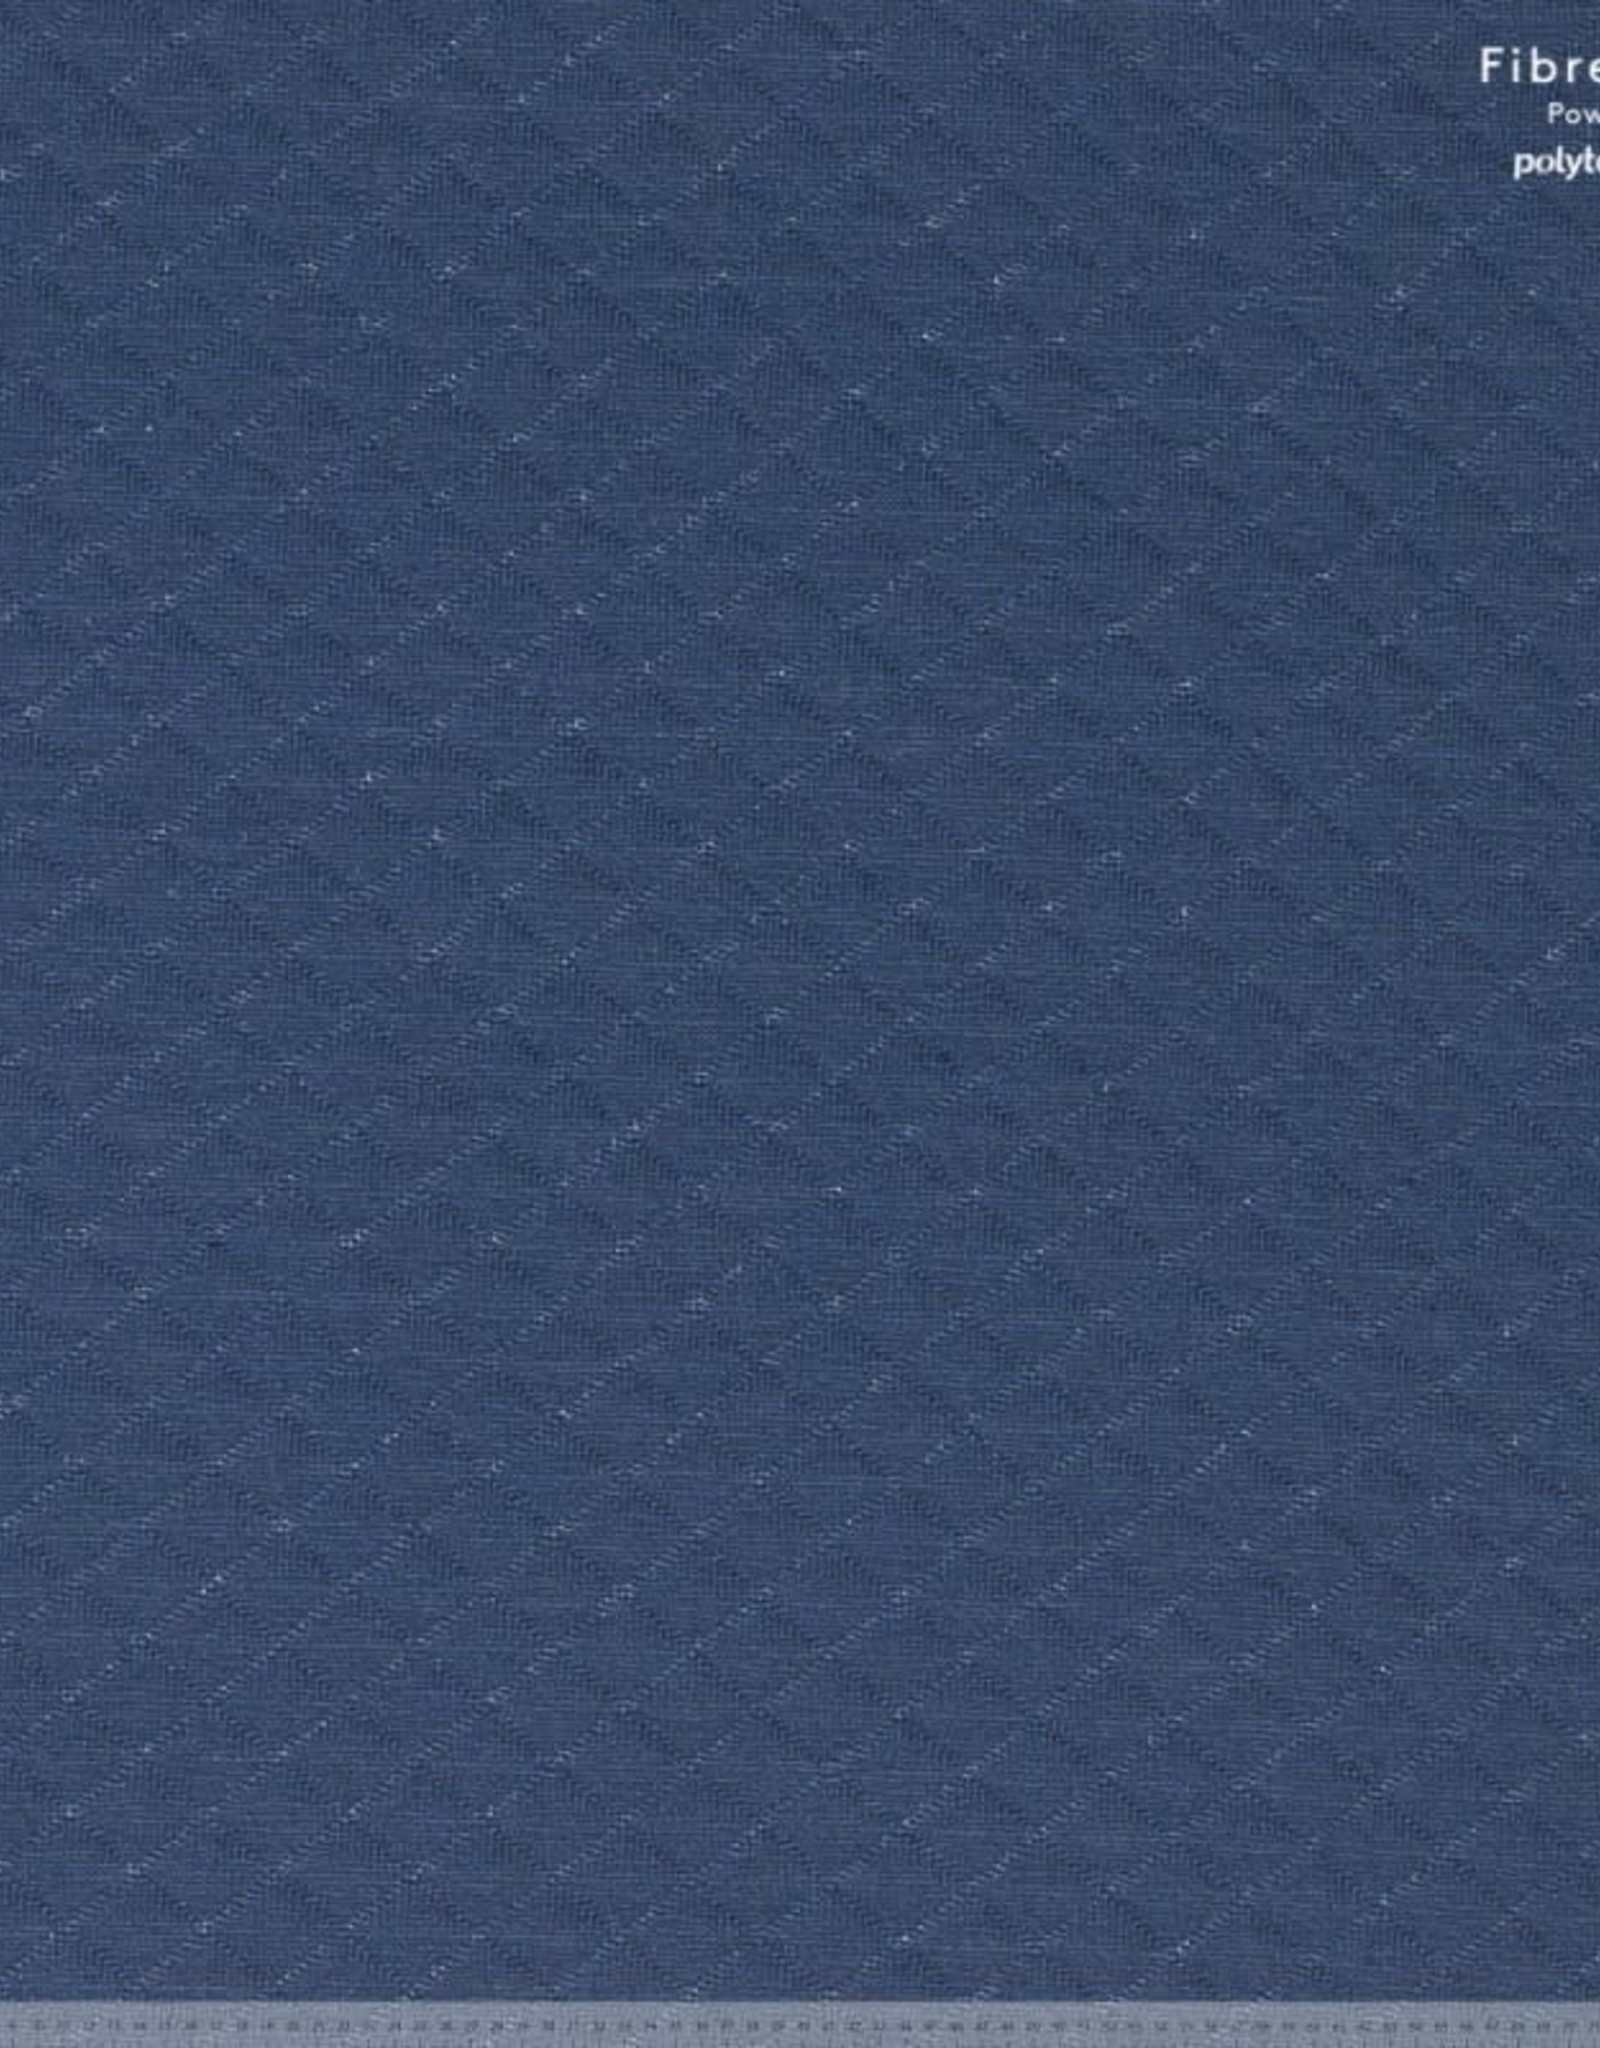 Polytex Quilted sweatshirt diamond